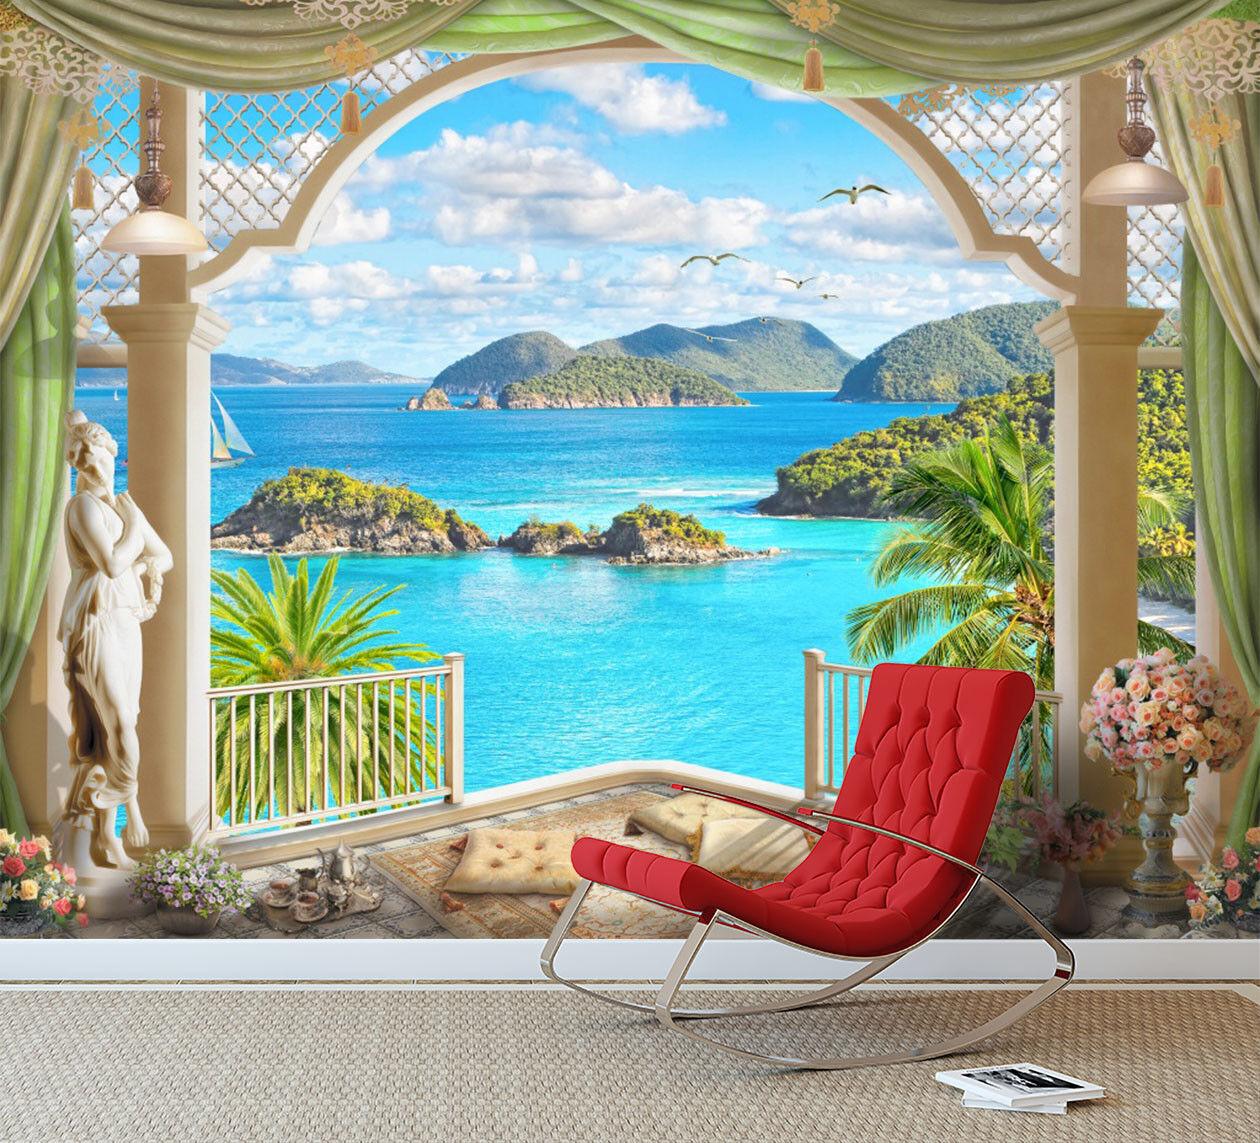 3D Charming Sea View 7 Wall Paper Murals Wall Print Wall Wallpaper Mural AU Kyra